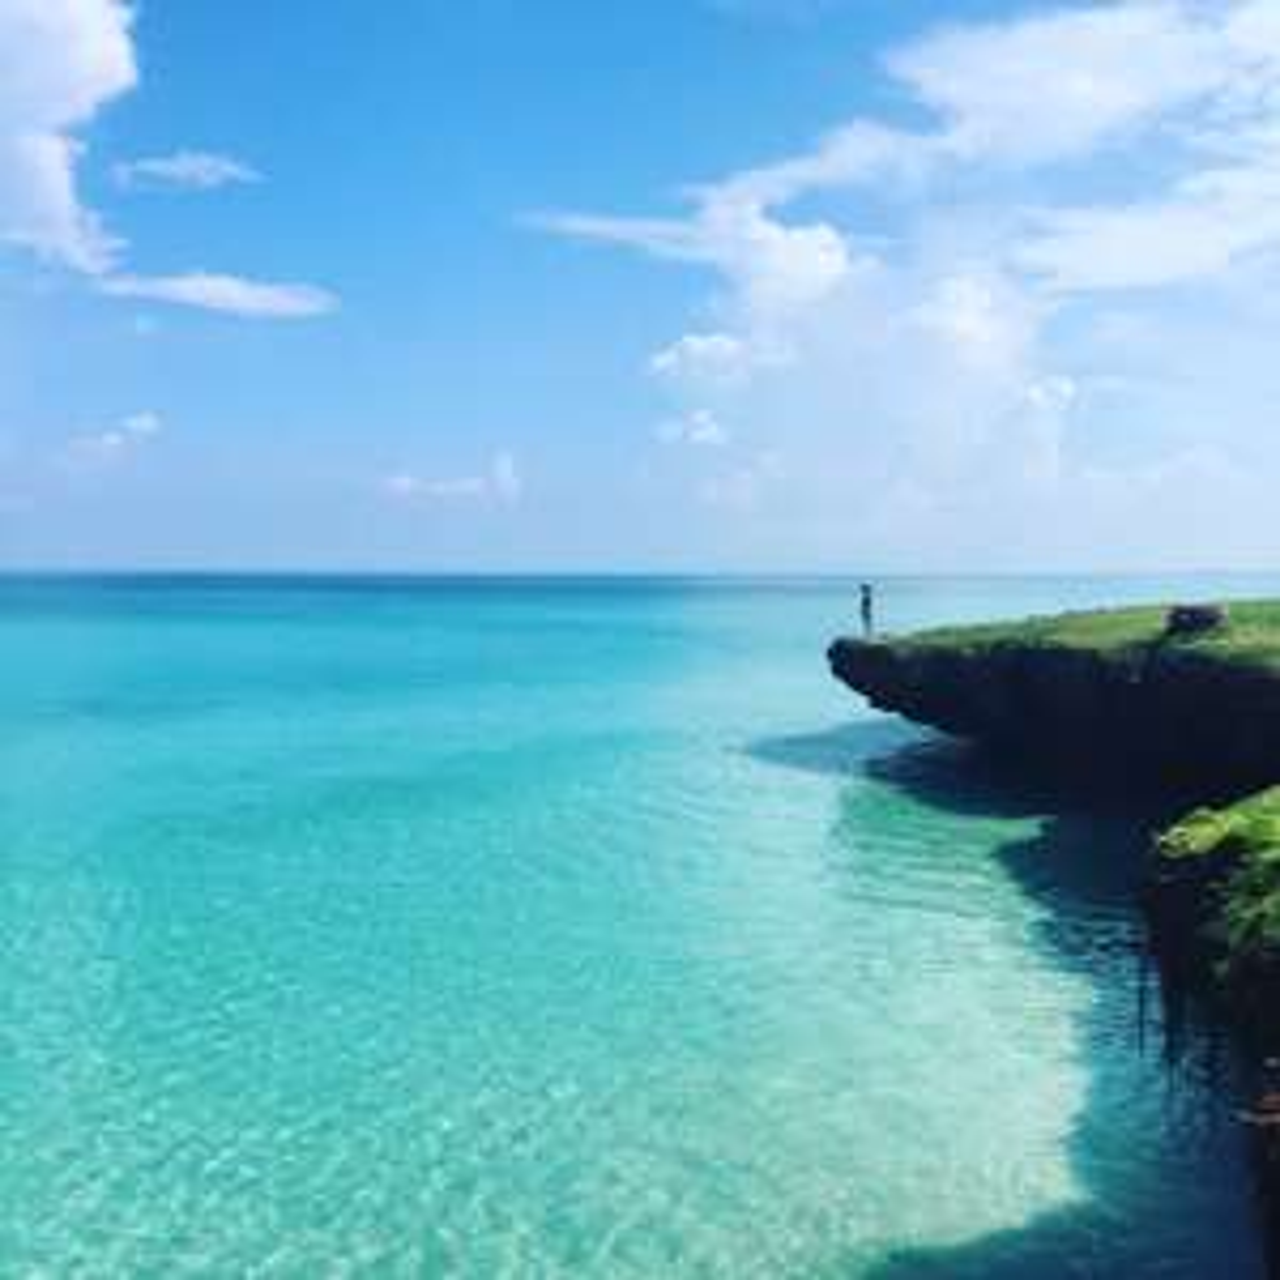 Flüge: Karibik [November] - Last-Minute - Direktflüge - Hin- und Rückflug von Düsseldorf oder Köln nach Punta Cana oder Varadero ab nur 274€ inkl. Gepäck